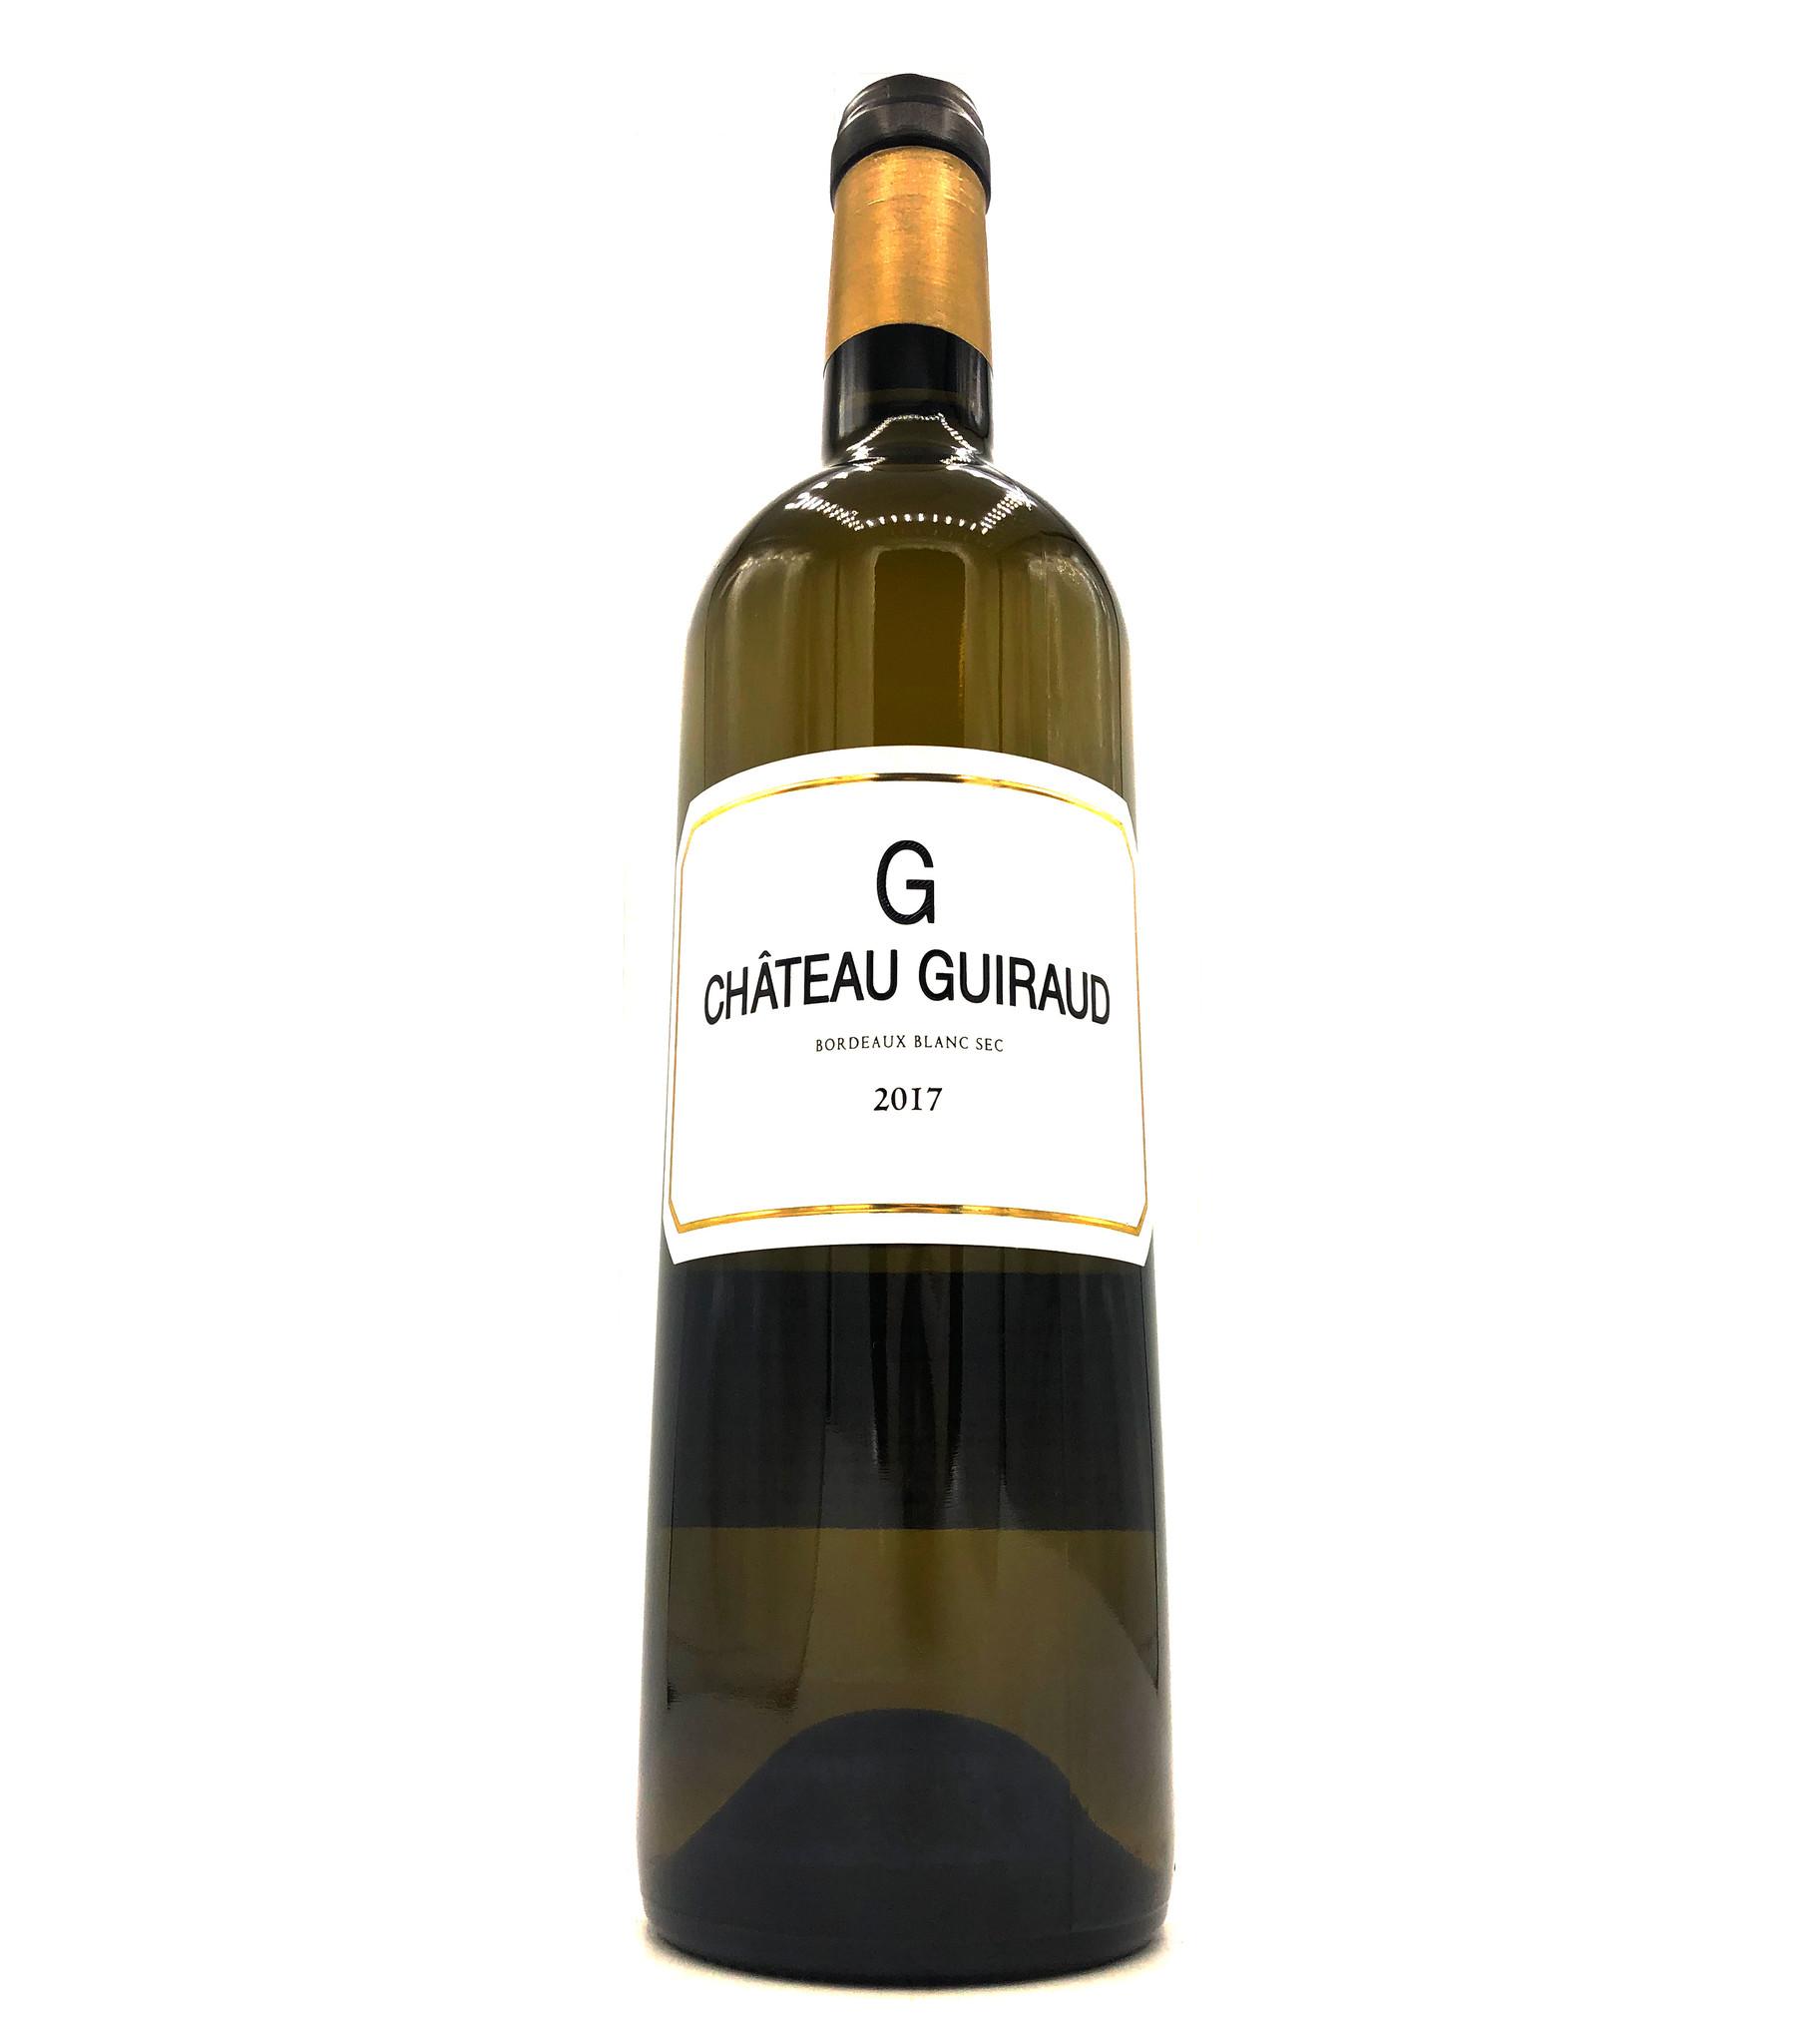 Bordeaux Blanc G de Guiraud 2017 Chateau Guiraud